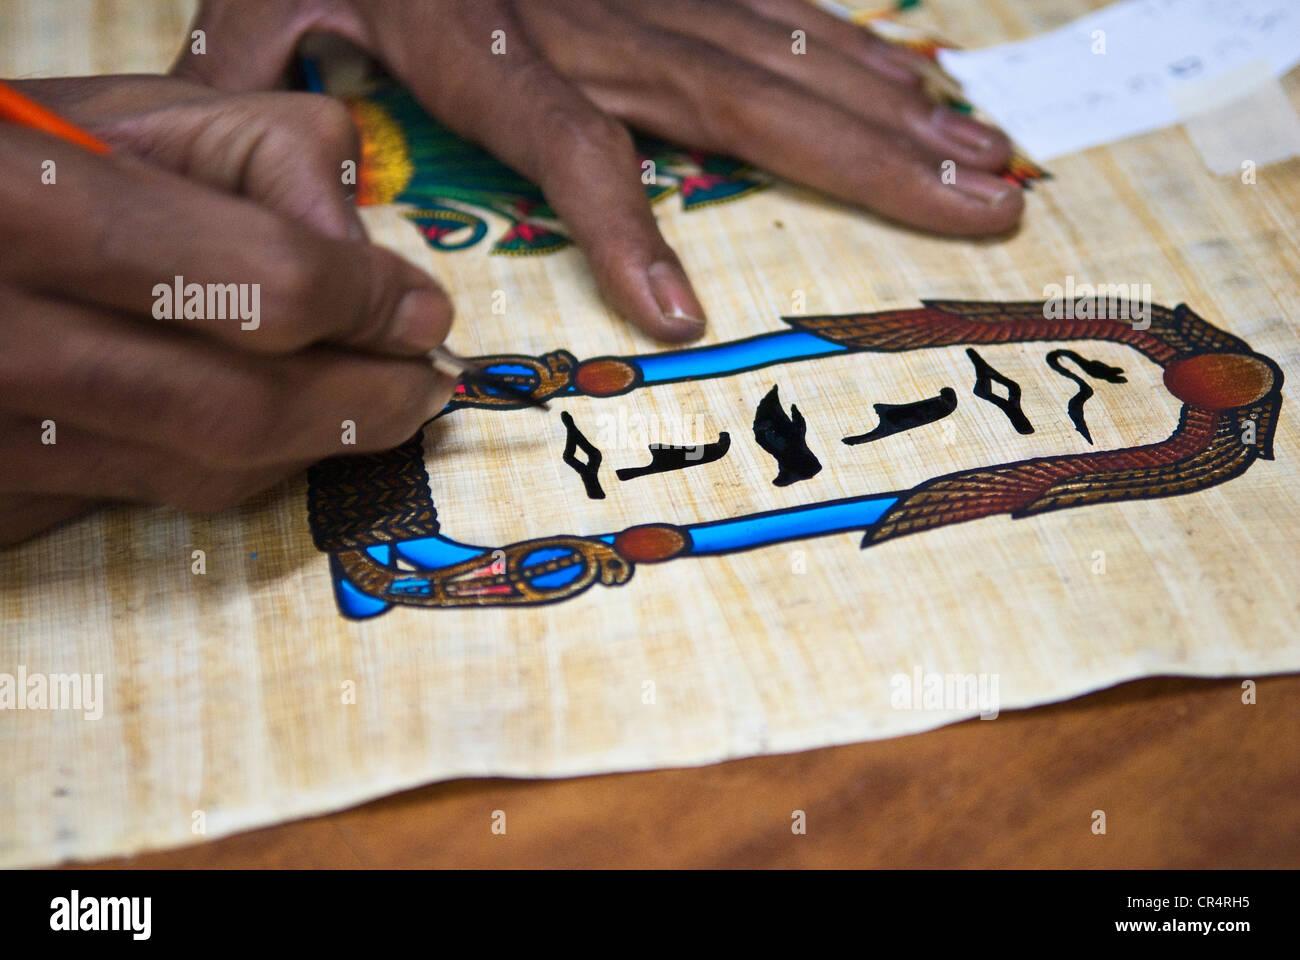 Egypt, Upper Egypt, Nubia, Aswan, papyrus handcraft showroom - Stock Image